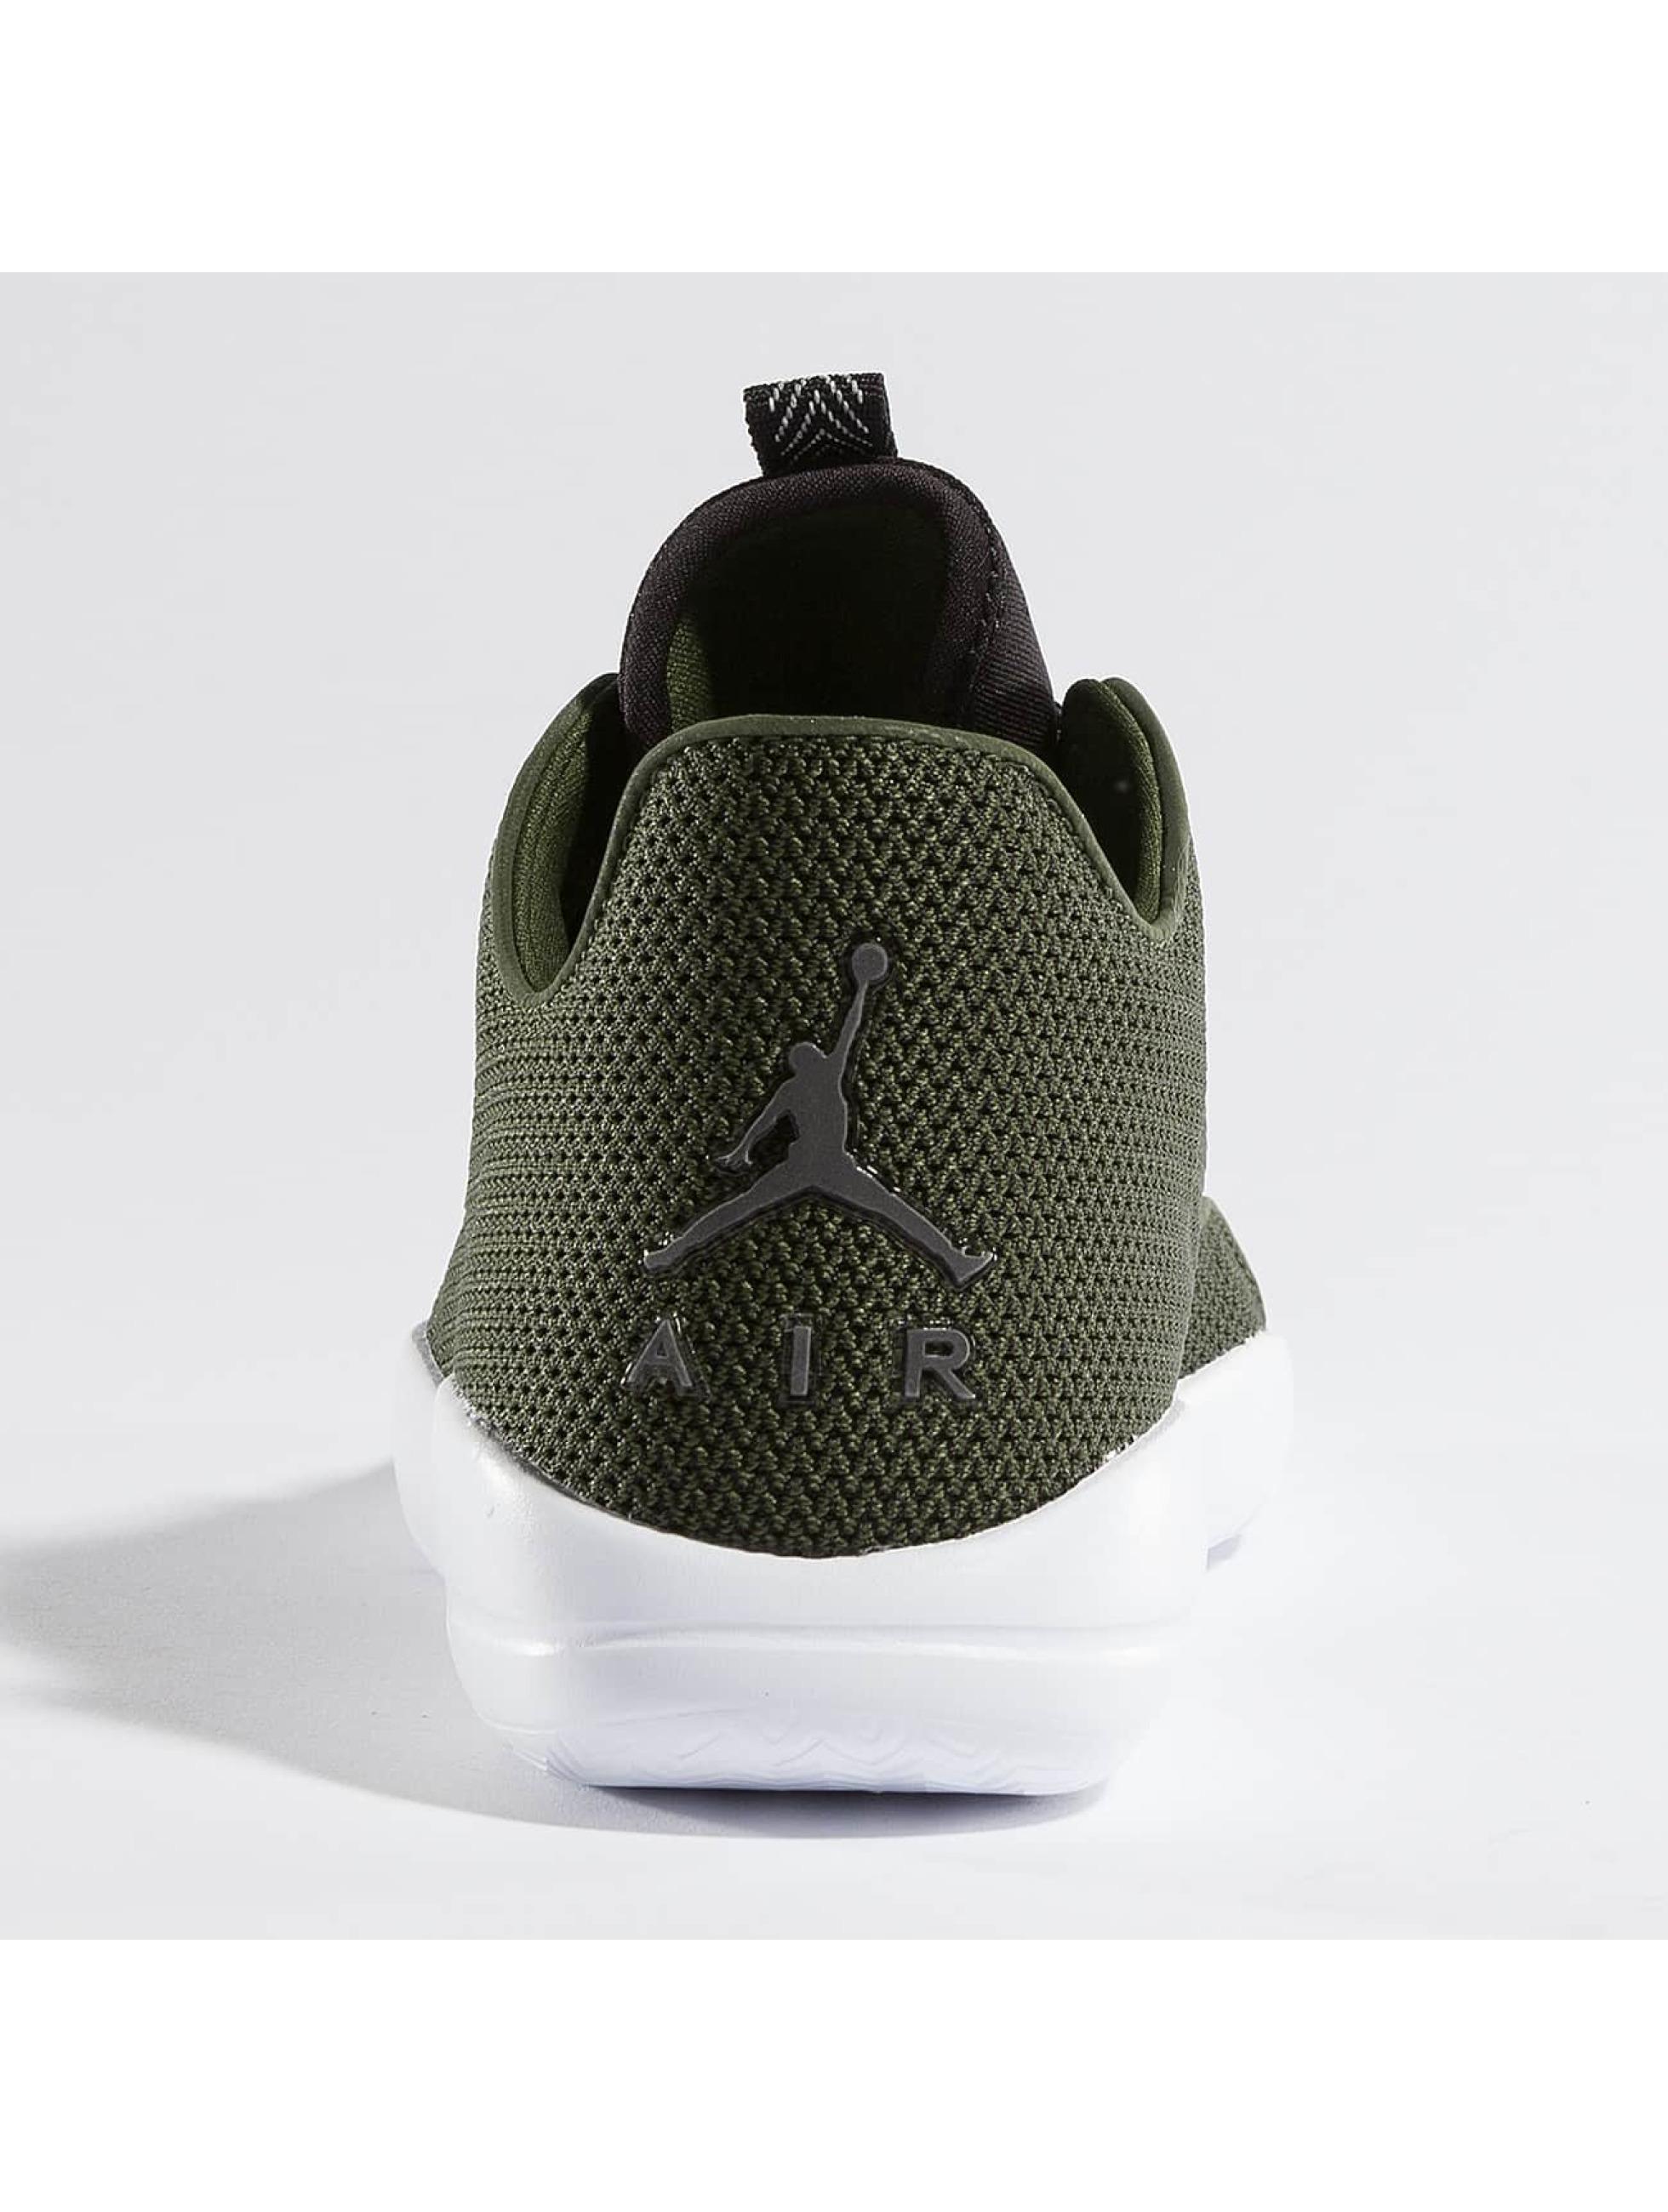 Jordan Sneaker Eclipse olive